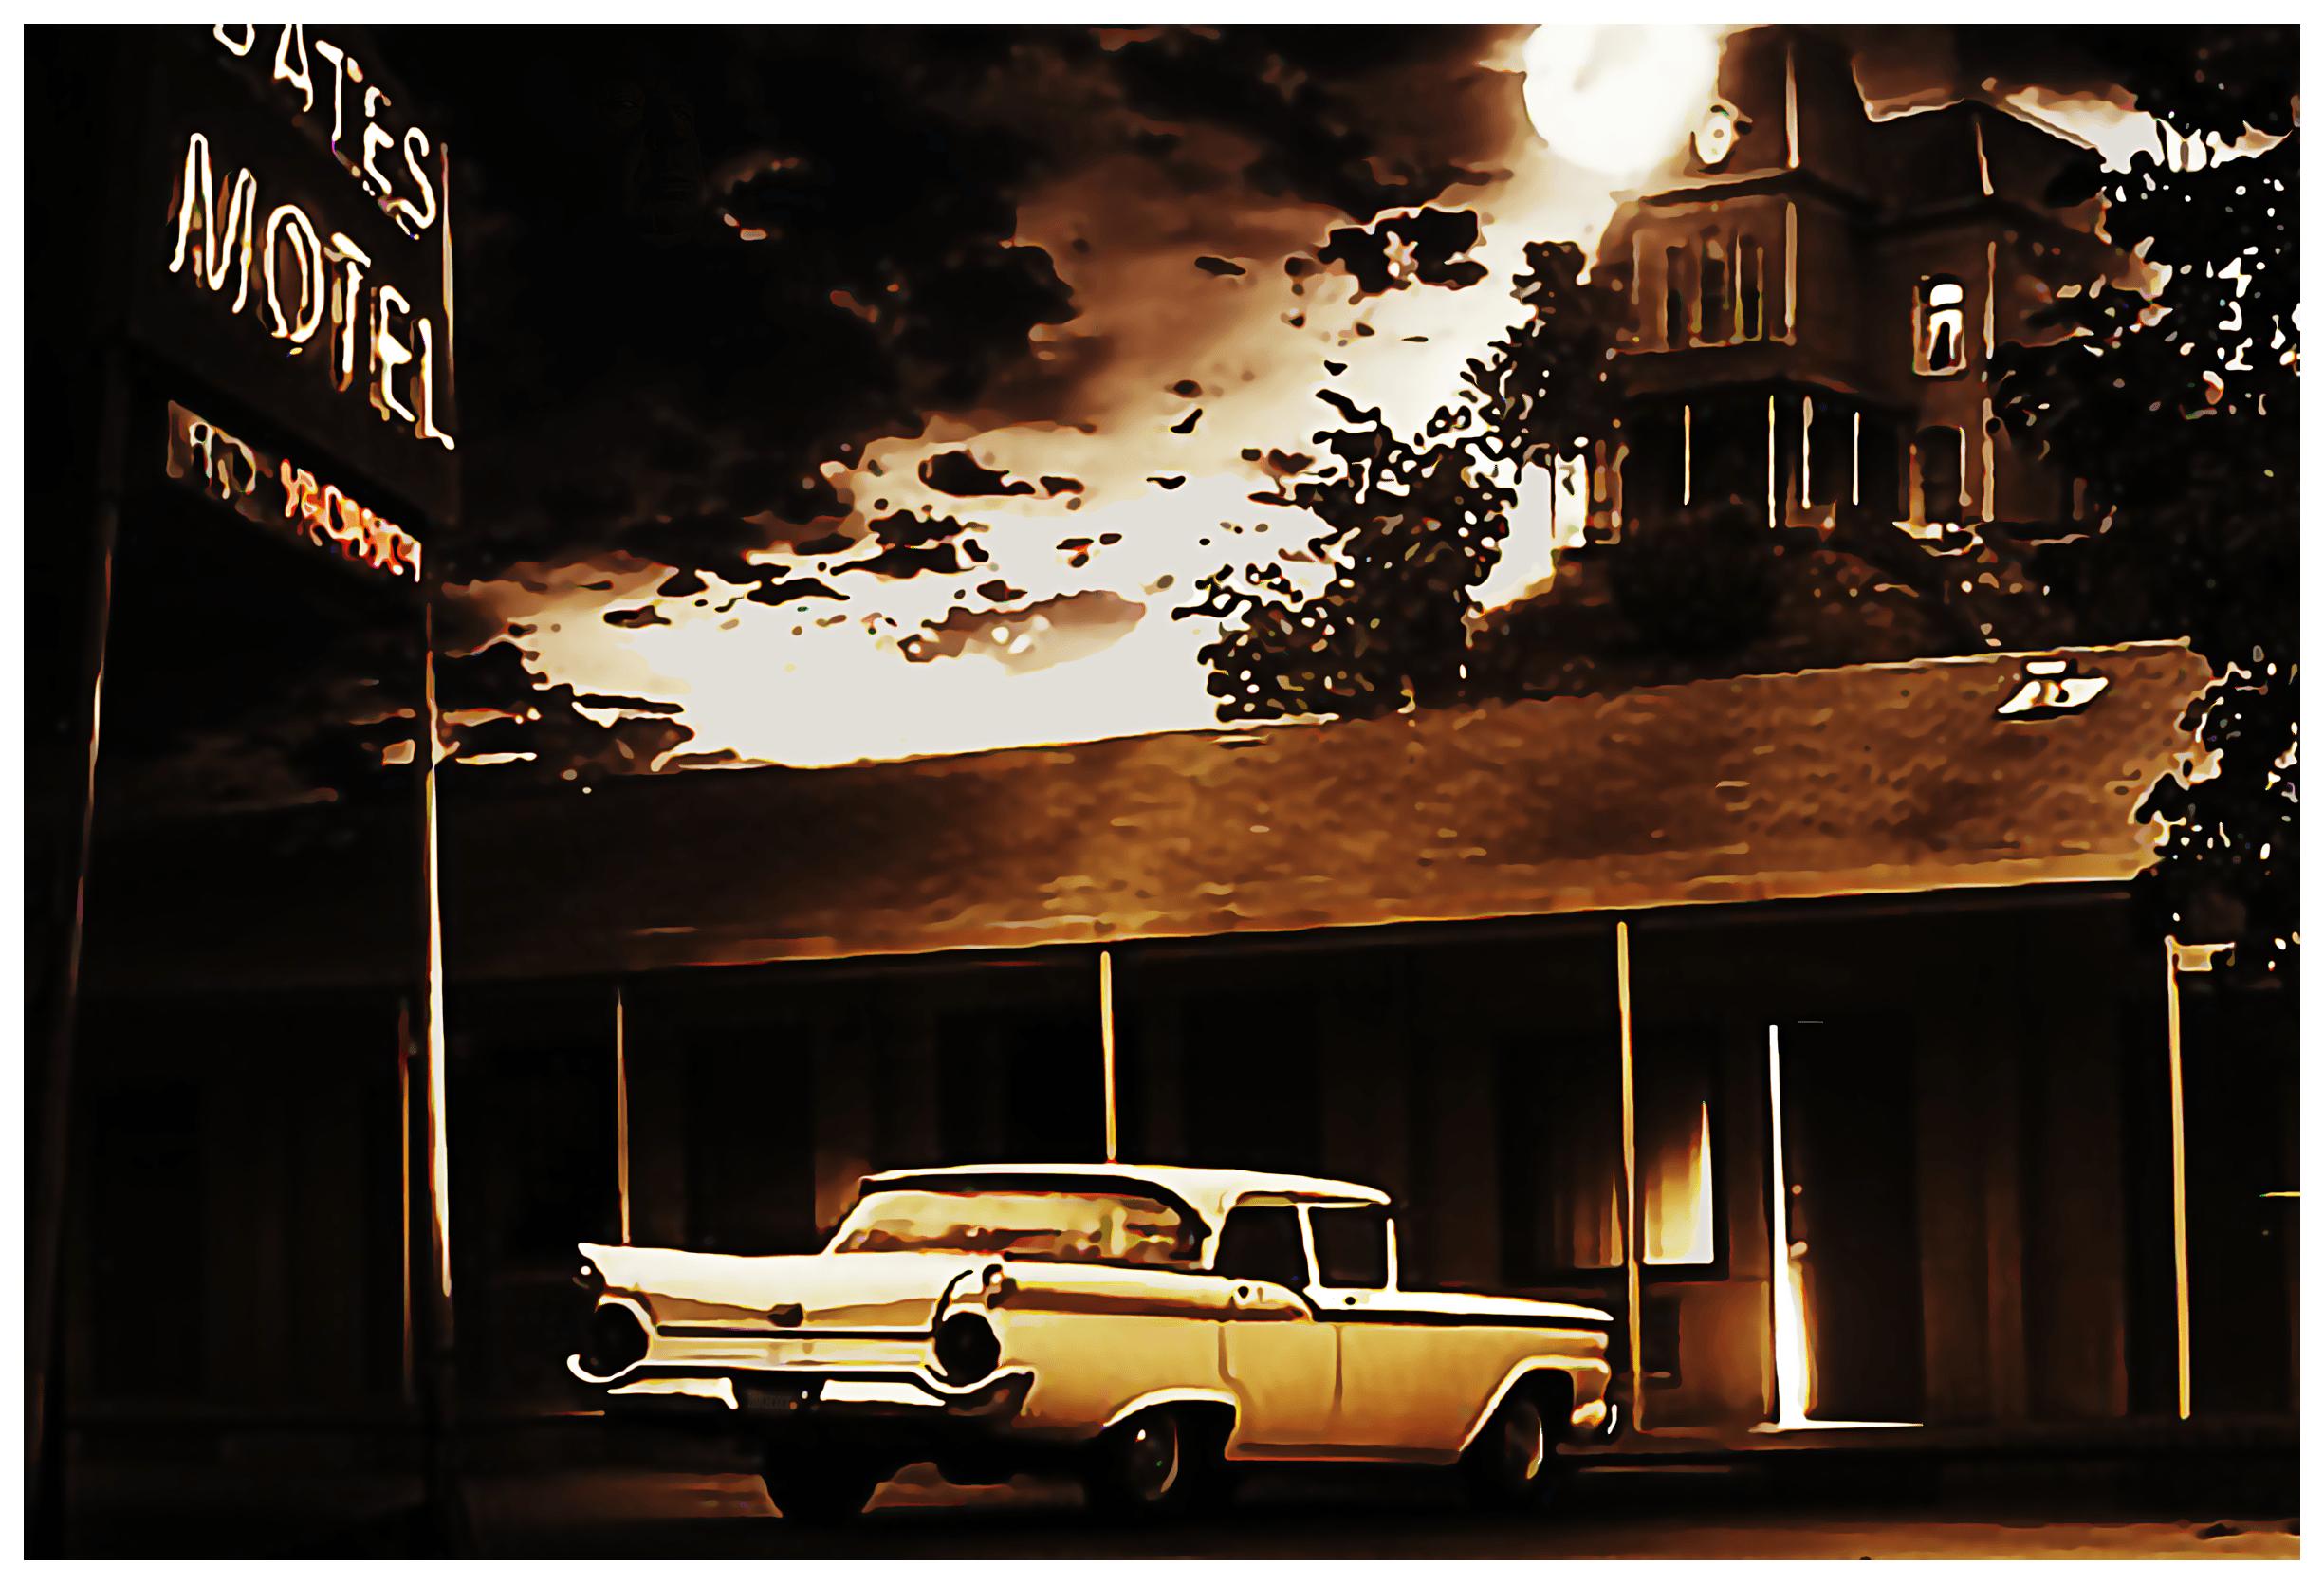 Bates Motel Wallpapers - Wallpaper Cave